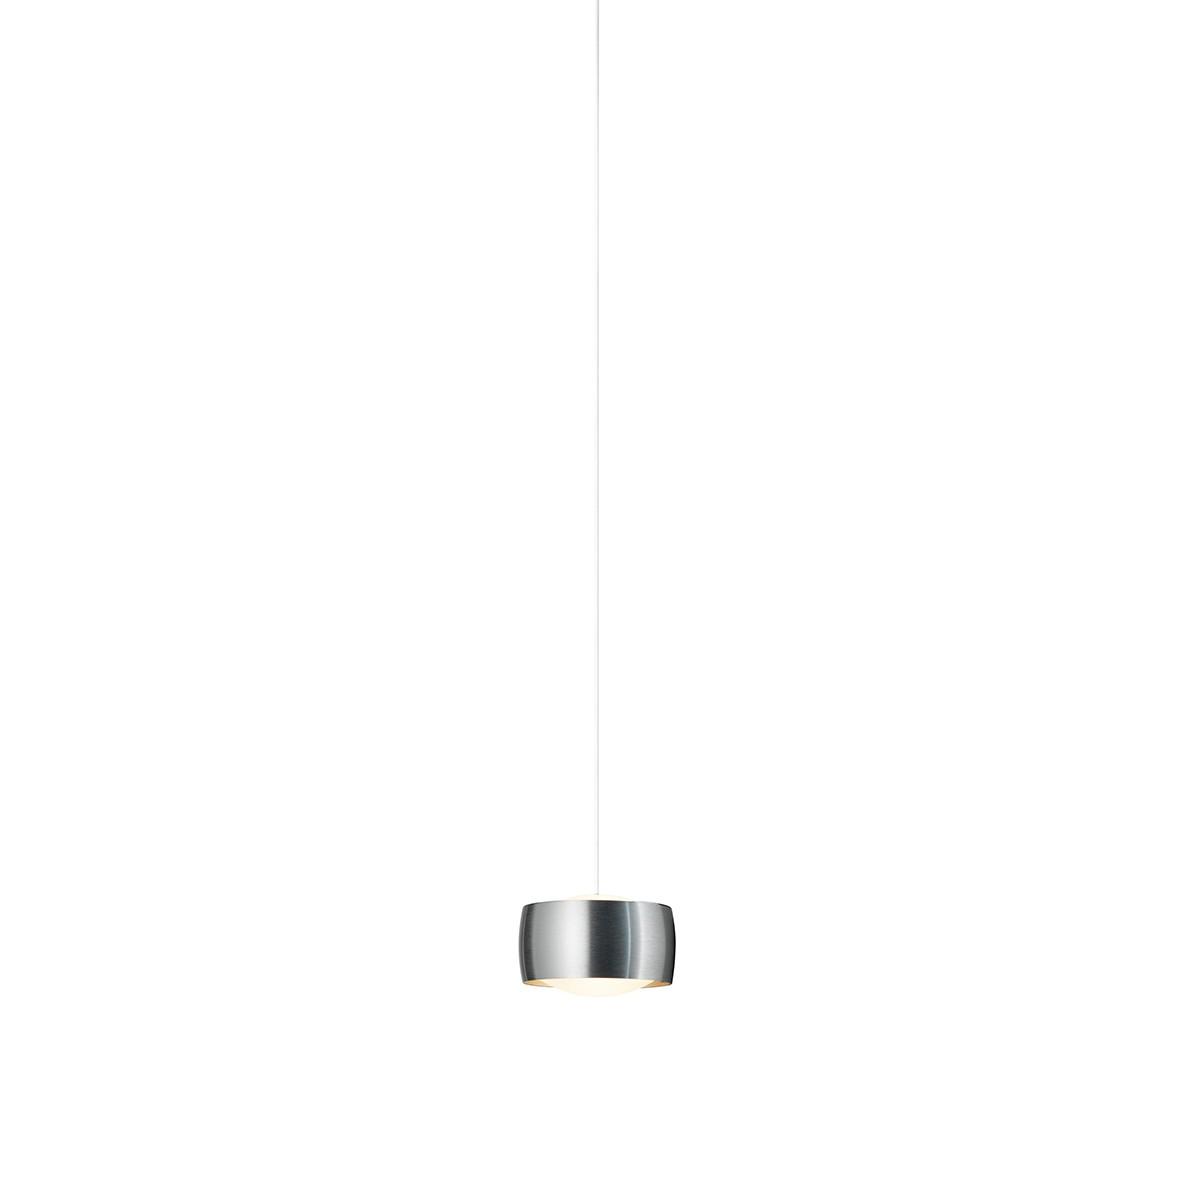 Oligo PHASE Grace LED Pendelleuchte, Aluminium gebürstet